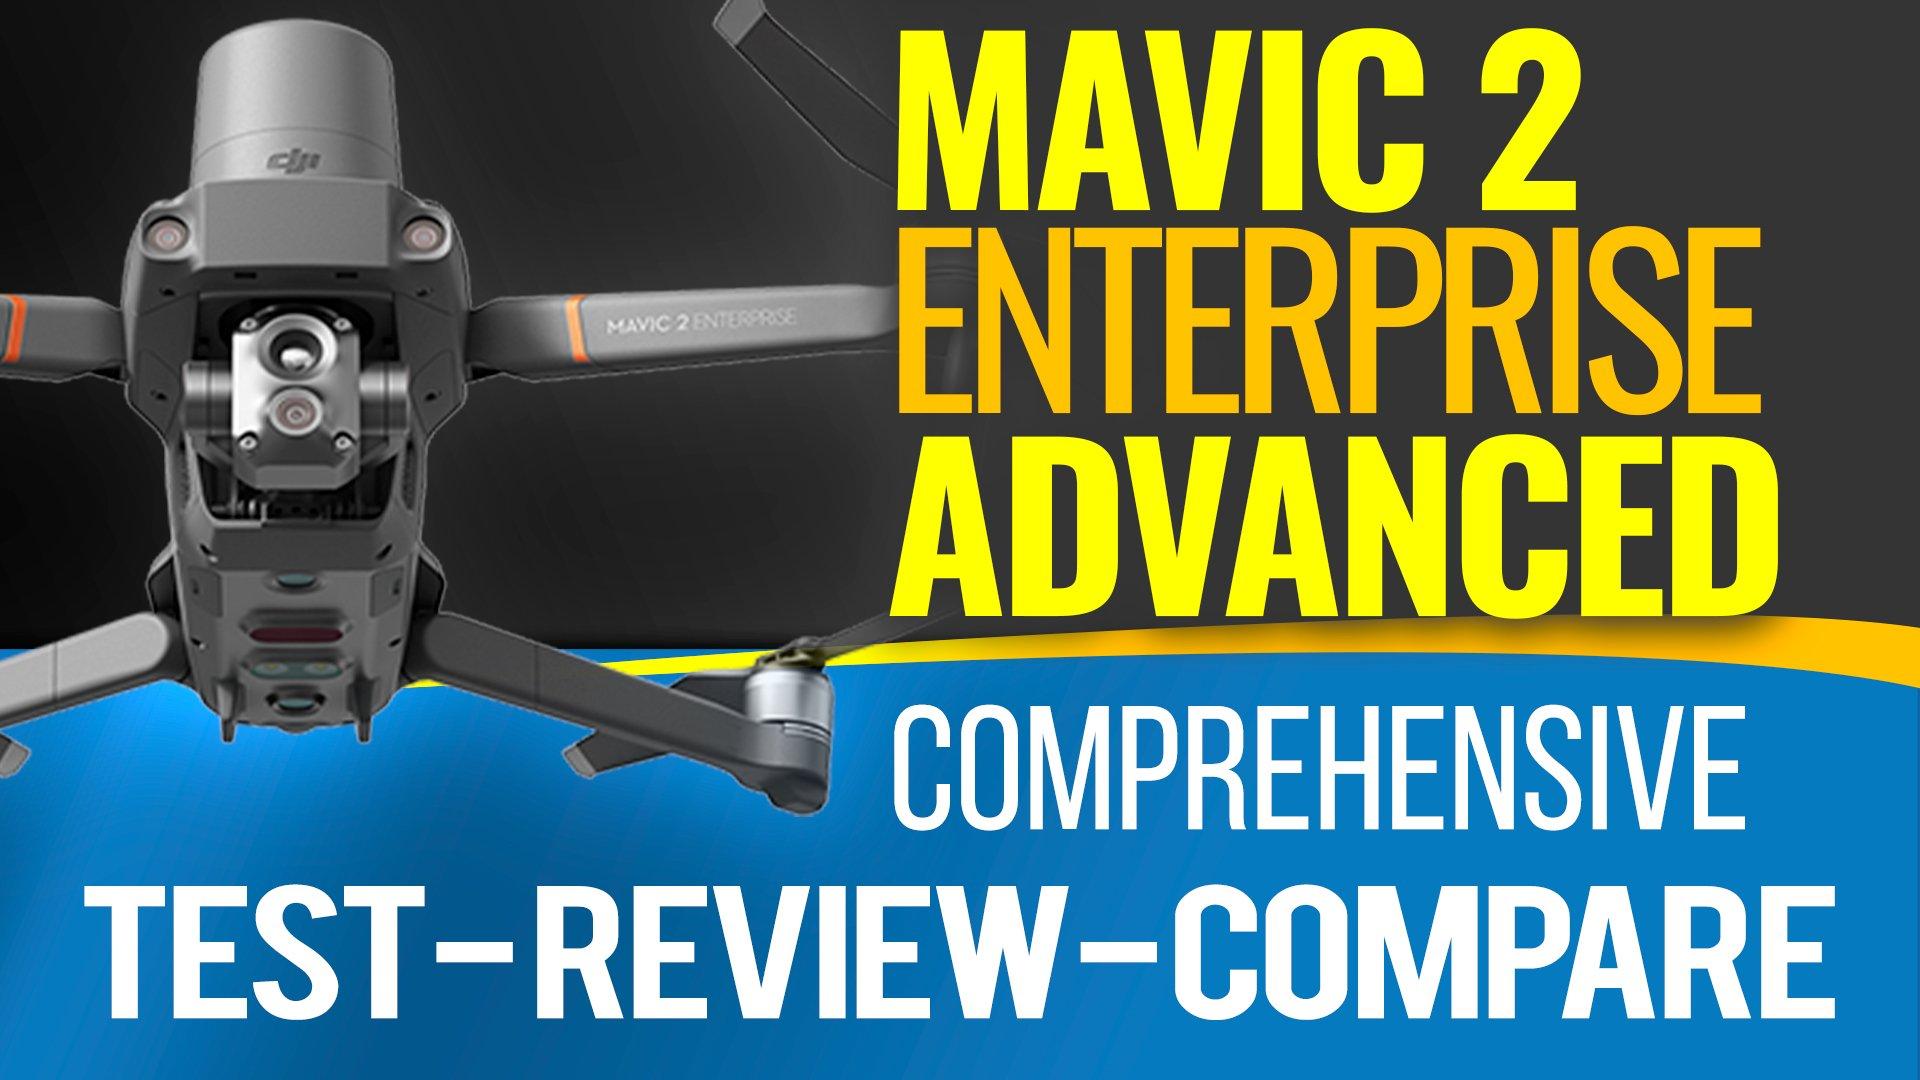 Mavic 2 Enterprise Advanced - Test and Review - Steel City Drones Flight Academy